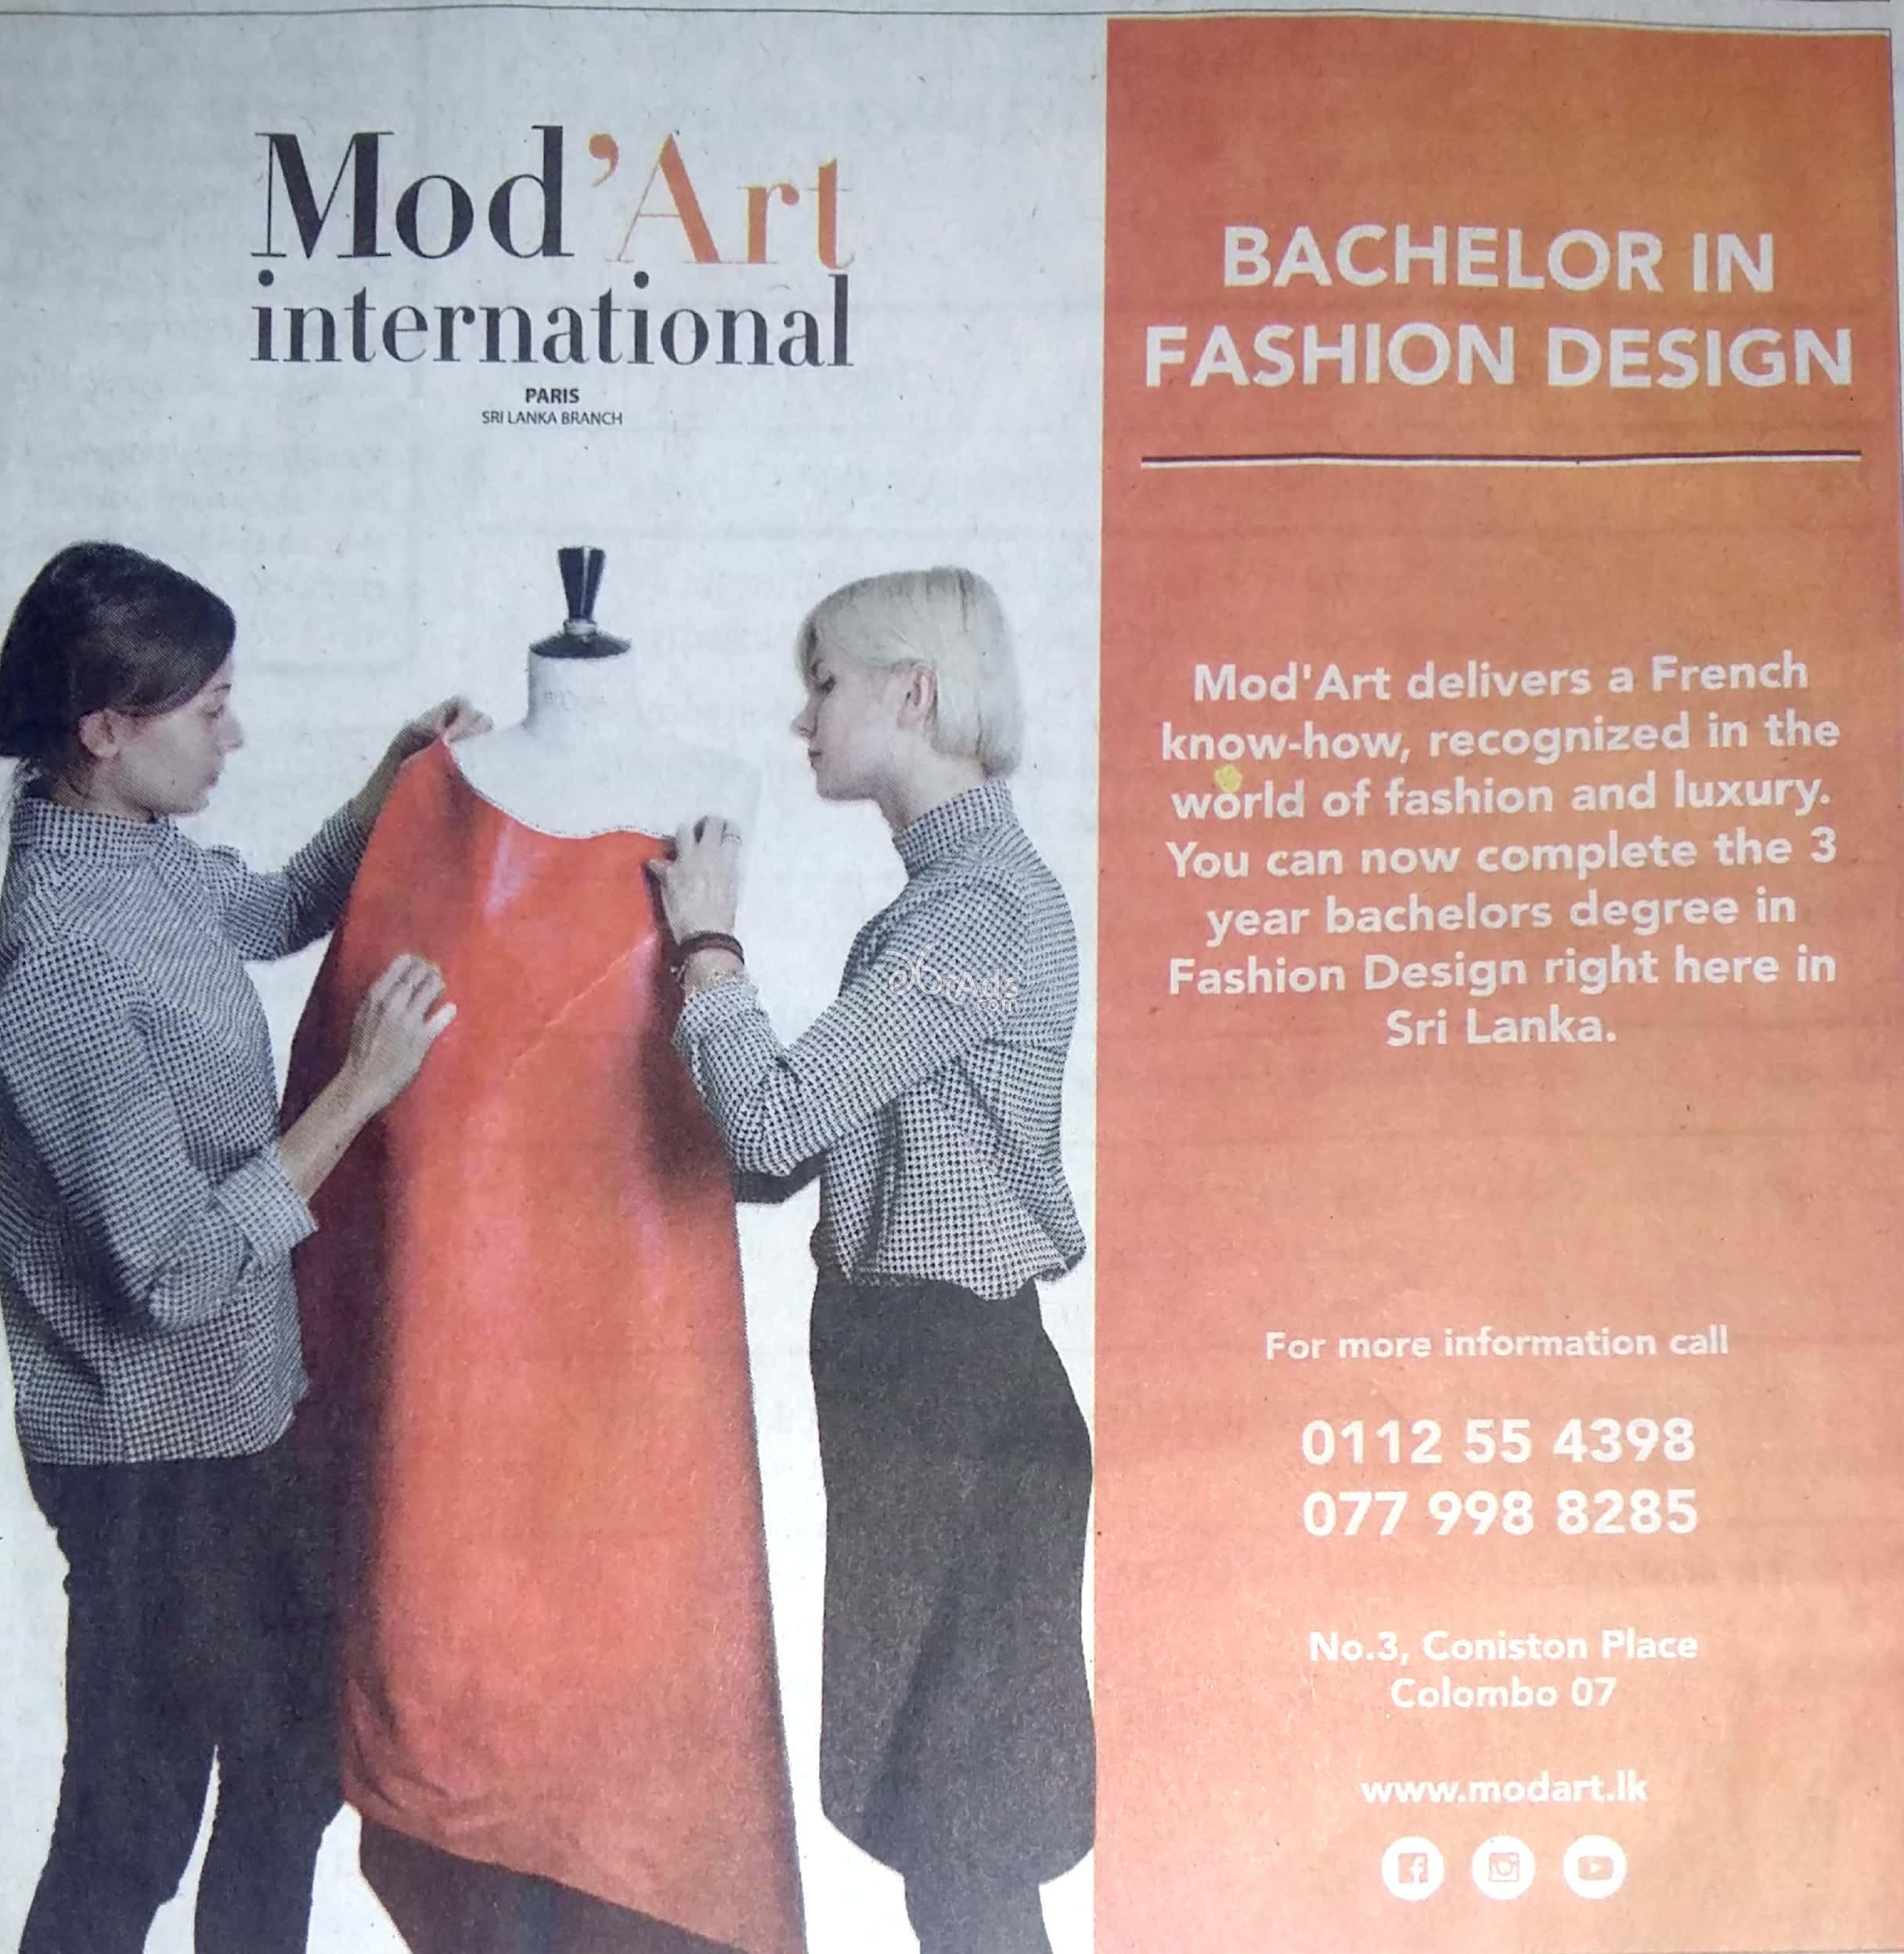 Bachelor Degree In Fashion Design At Mod Art International Paris Fashion School Colombo 07